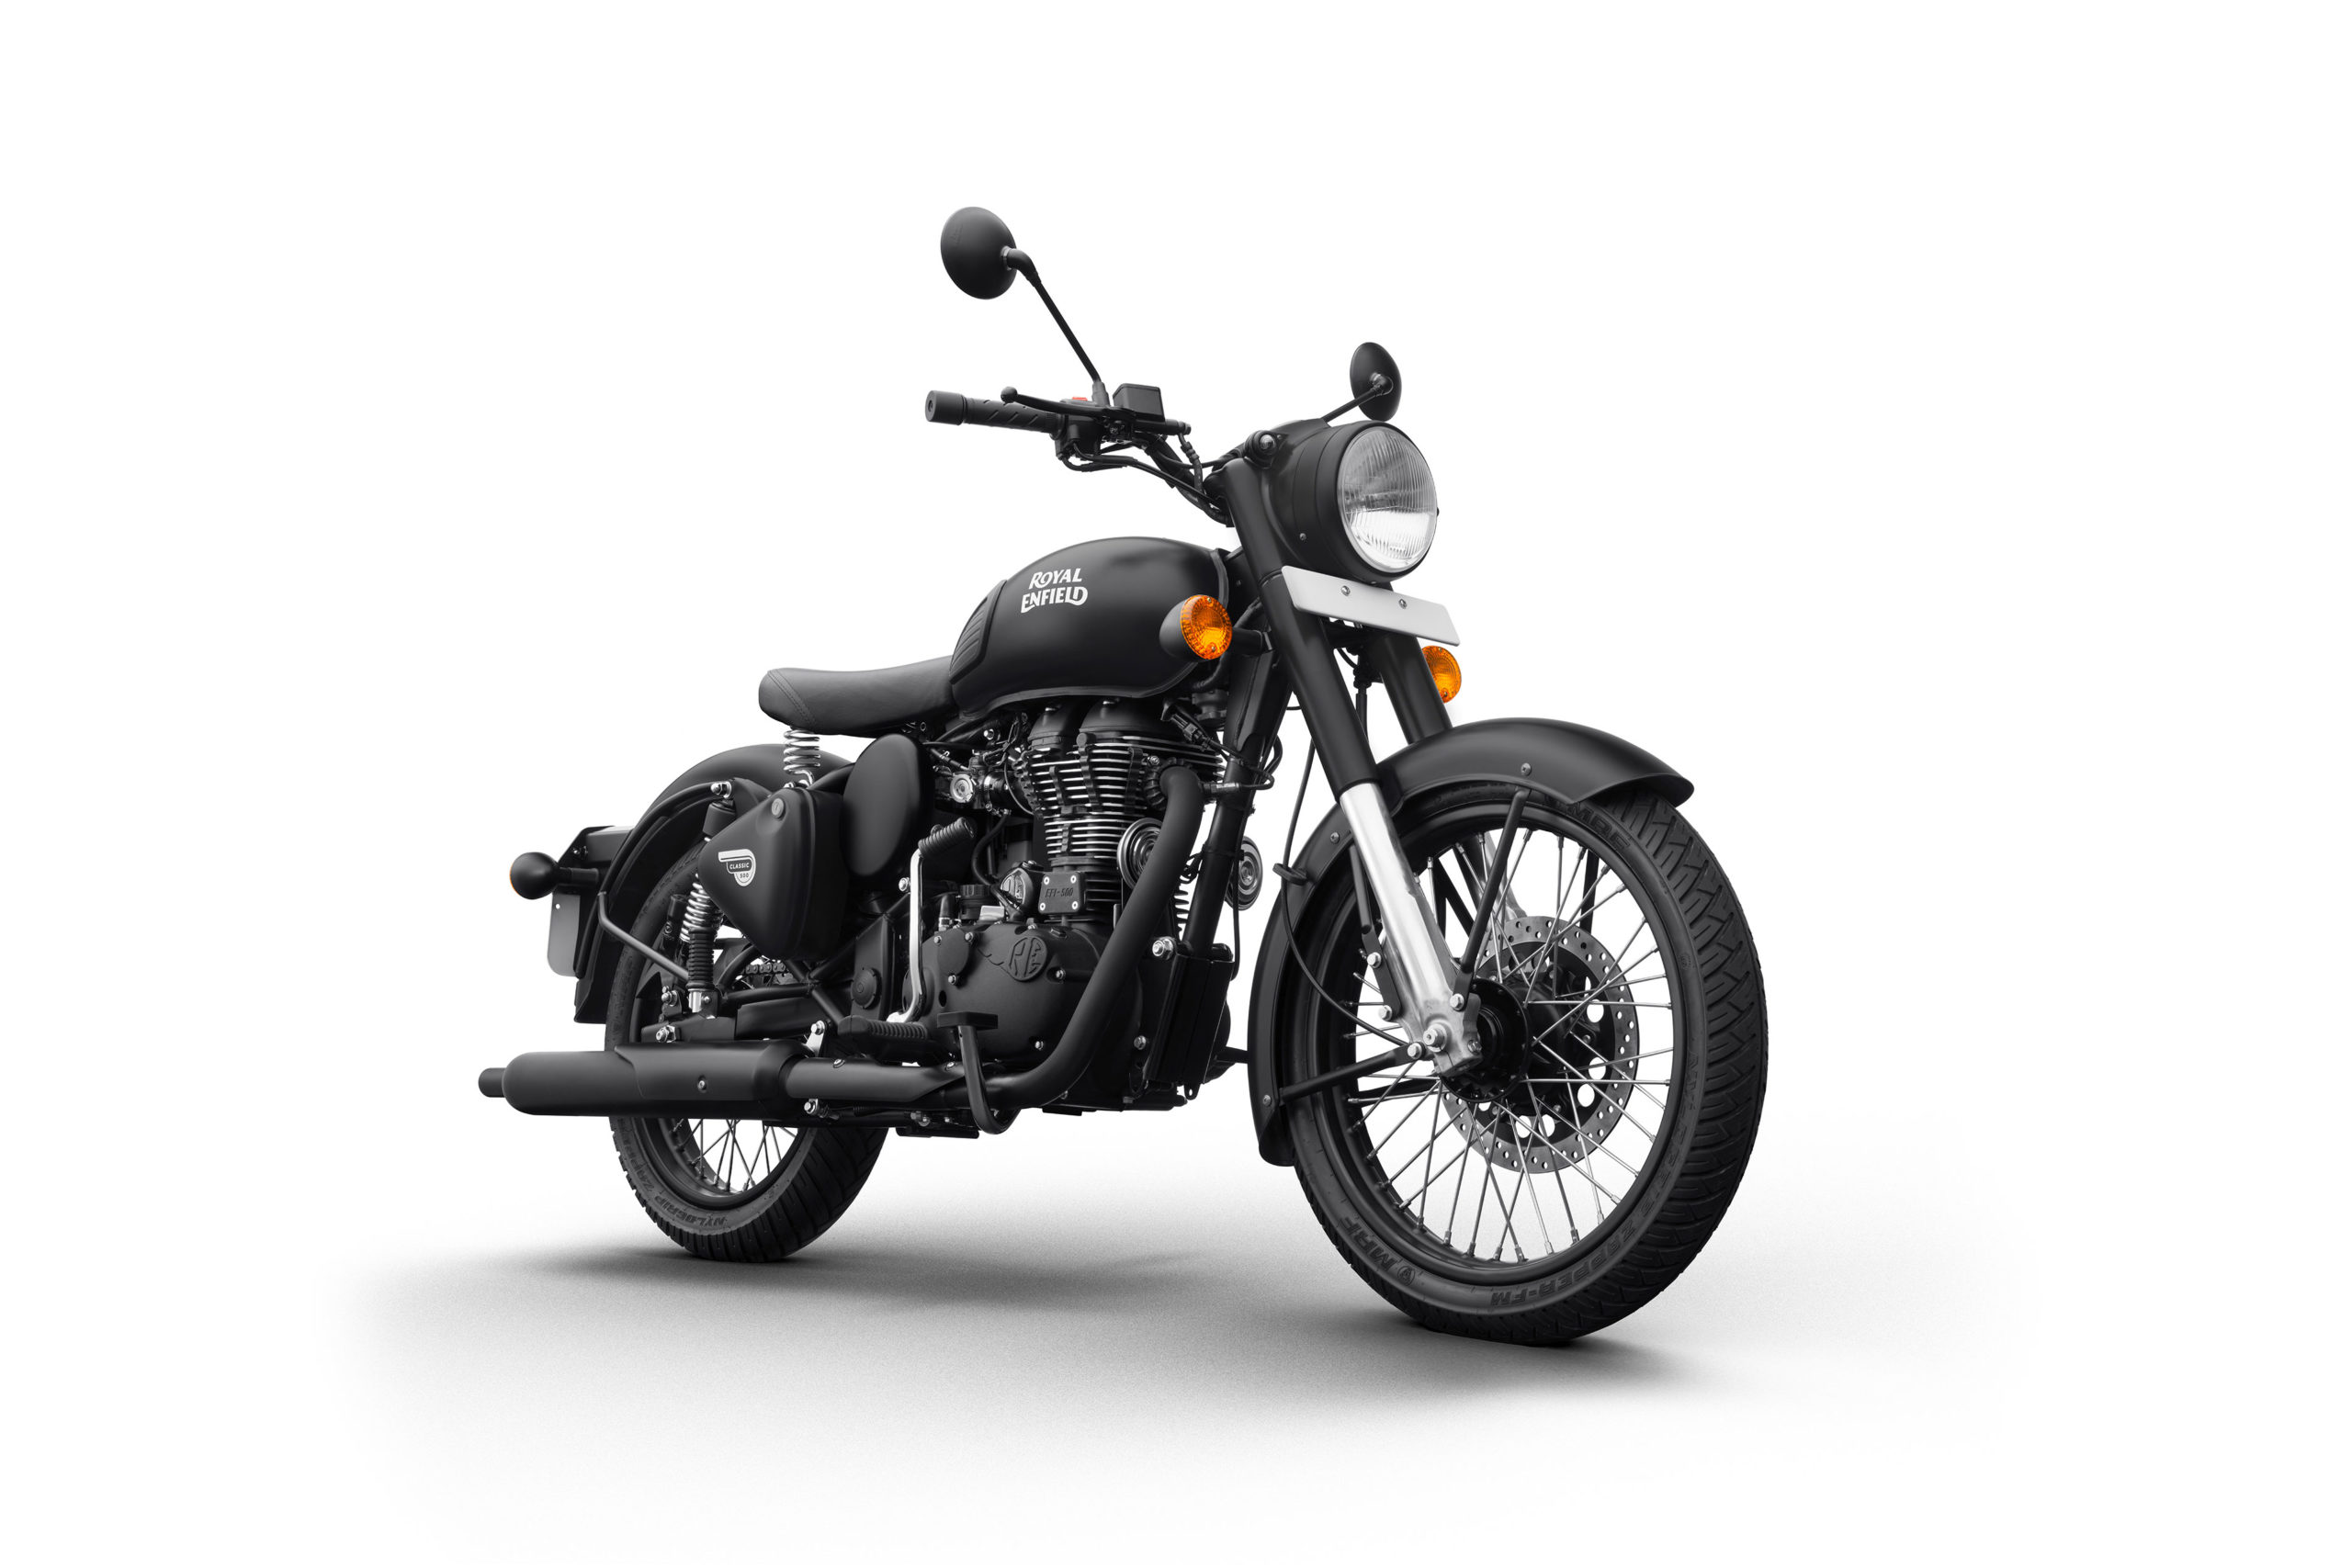 Moto Royal Enfield Gland